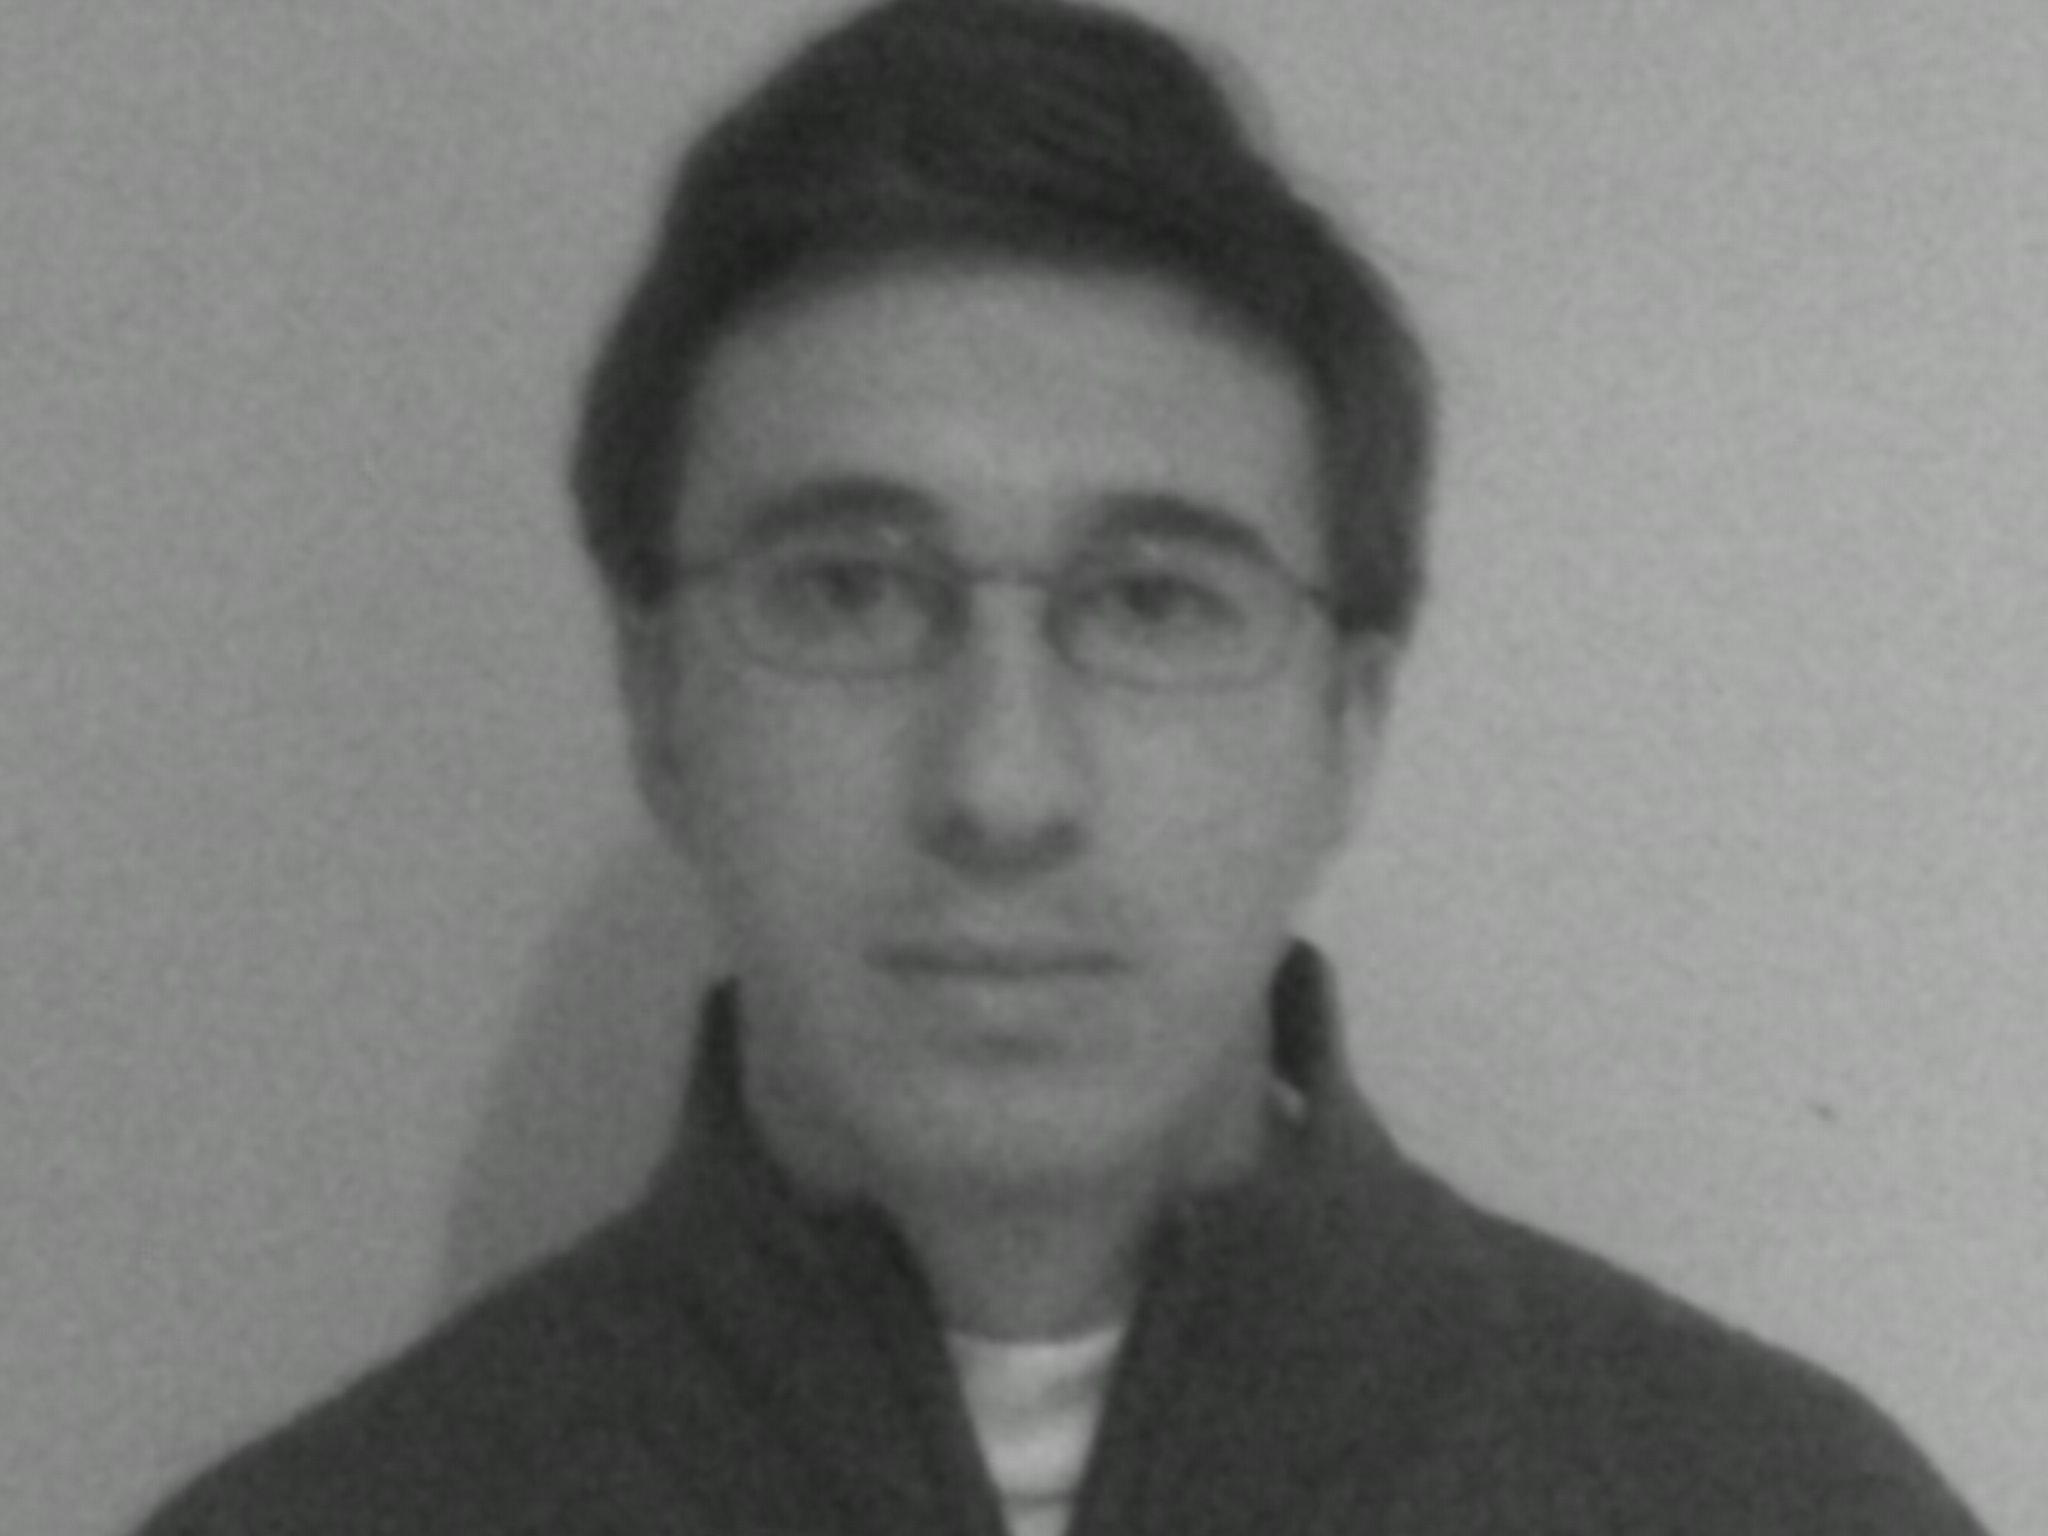 Julio Gómez Martín